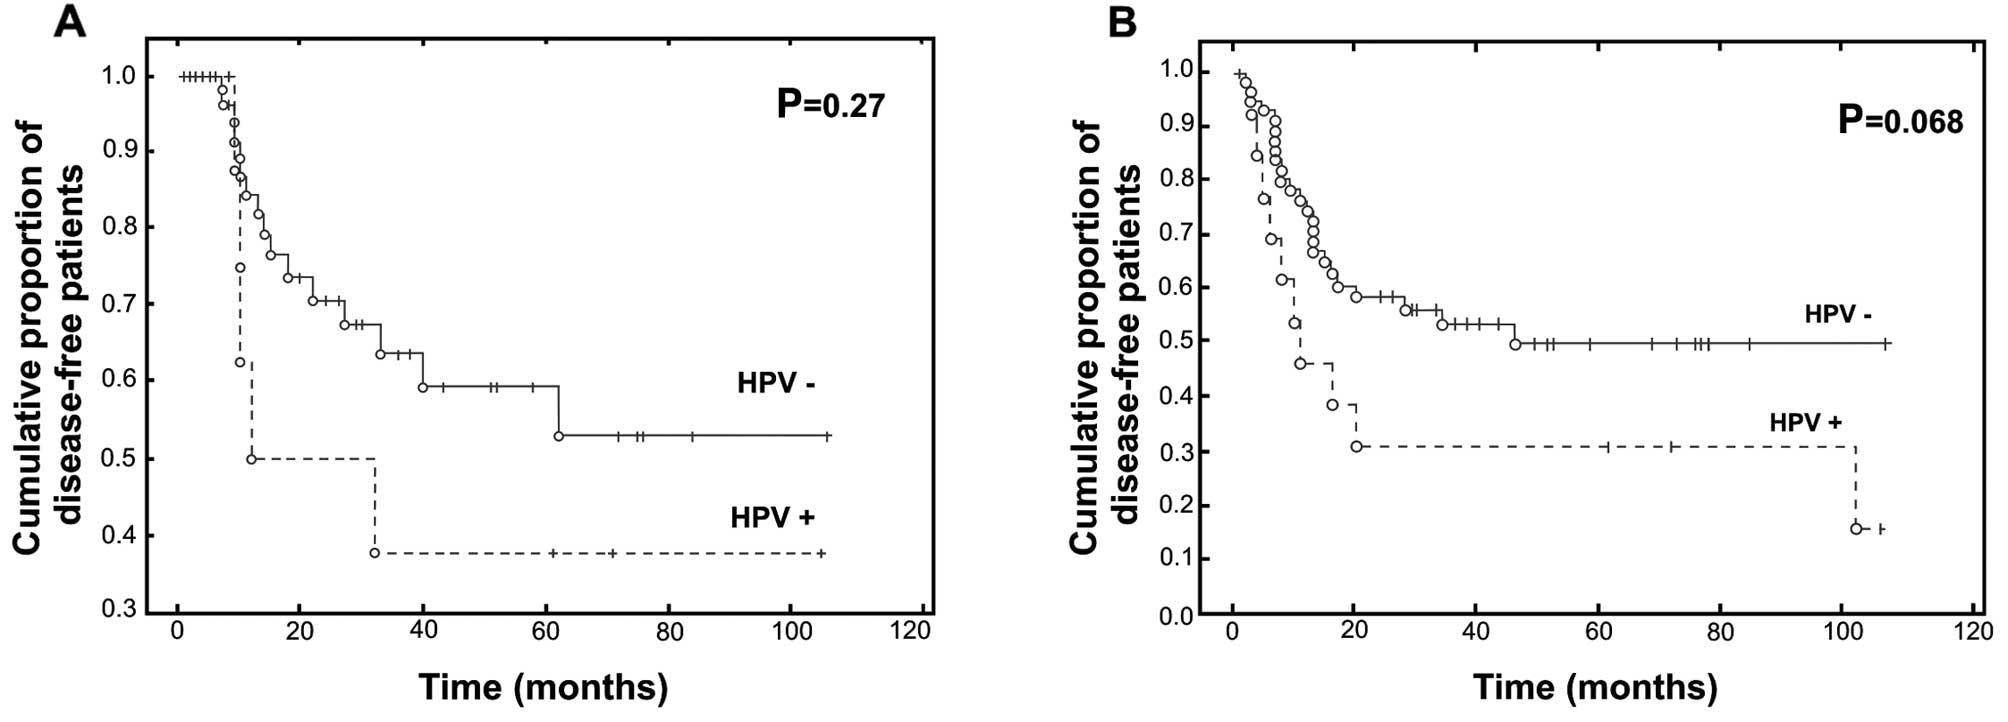 hpv cancer prognosis bladder cancer genetic heterogeneity